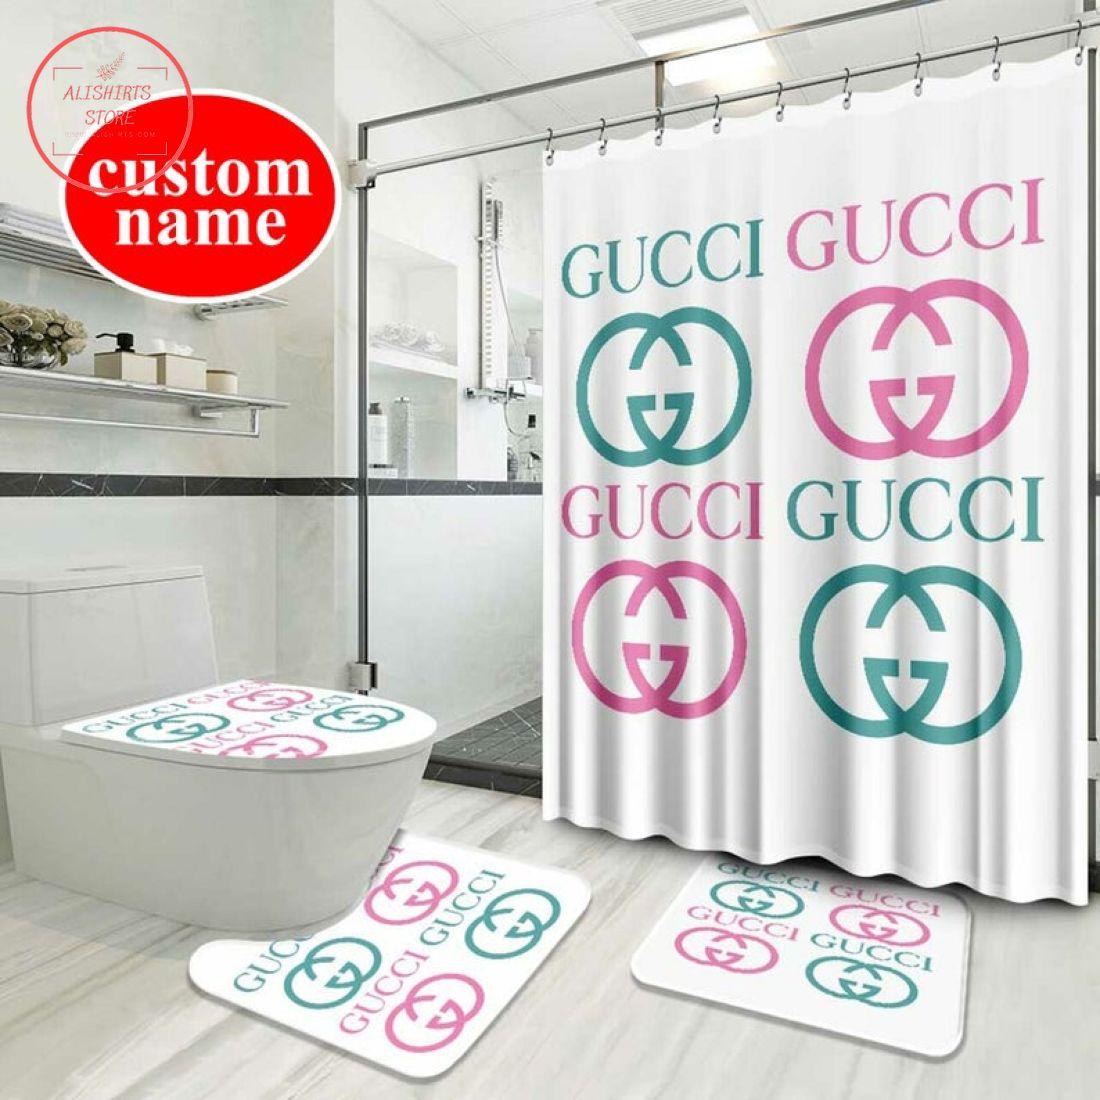 Gucci Waterproof Shower Curtain Window Curtain